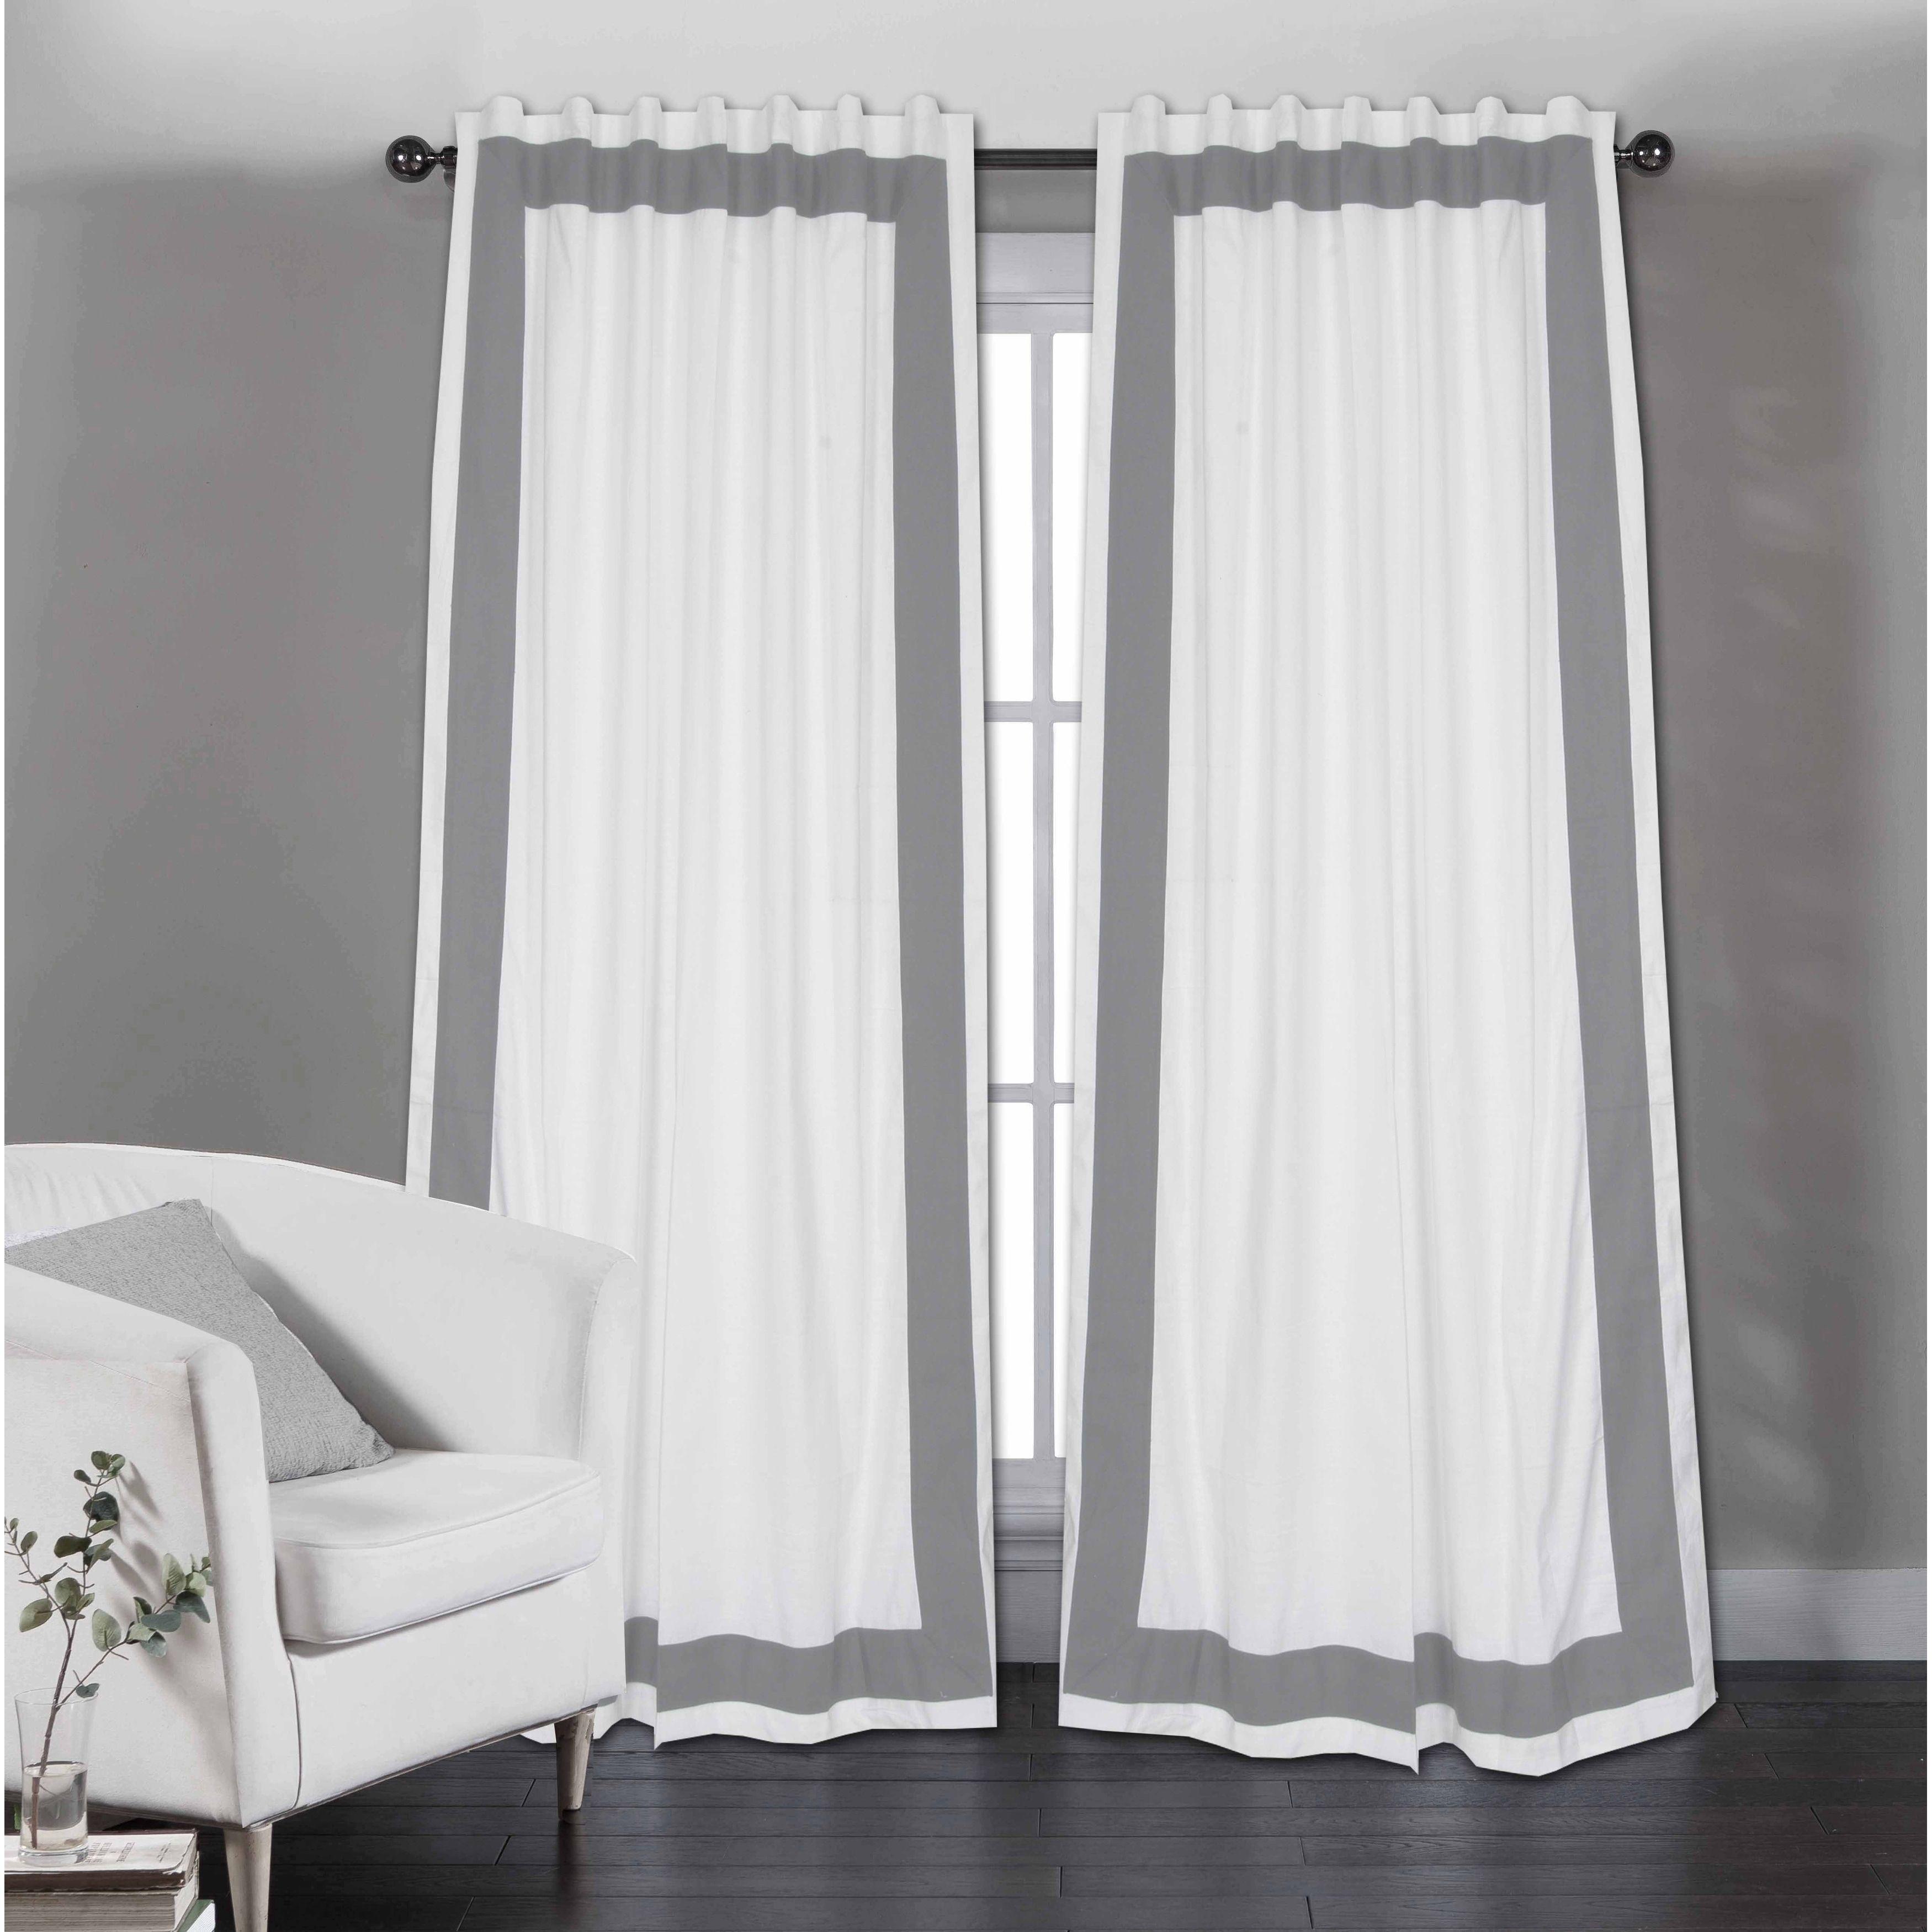 Copper Grove Stavoren White Cotton Curtain Panels With Grey Trim